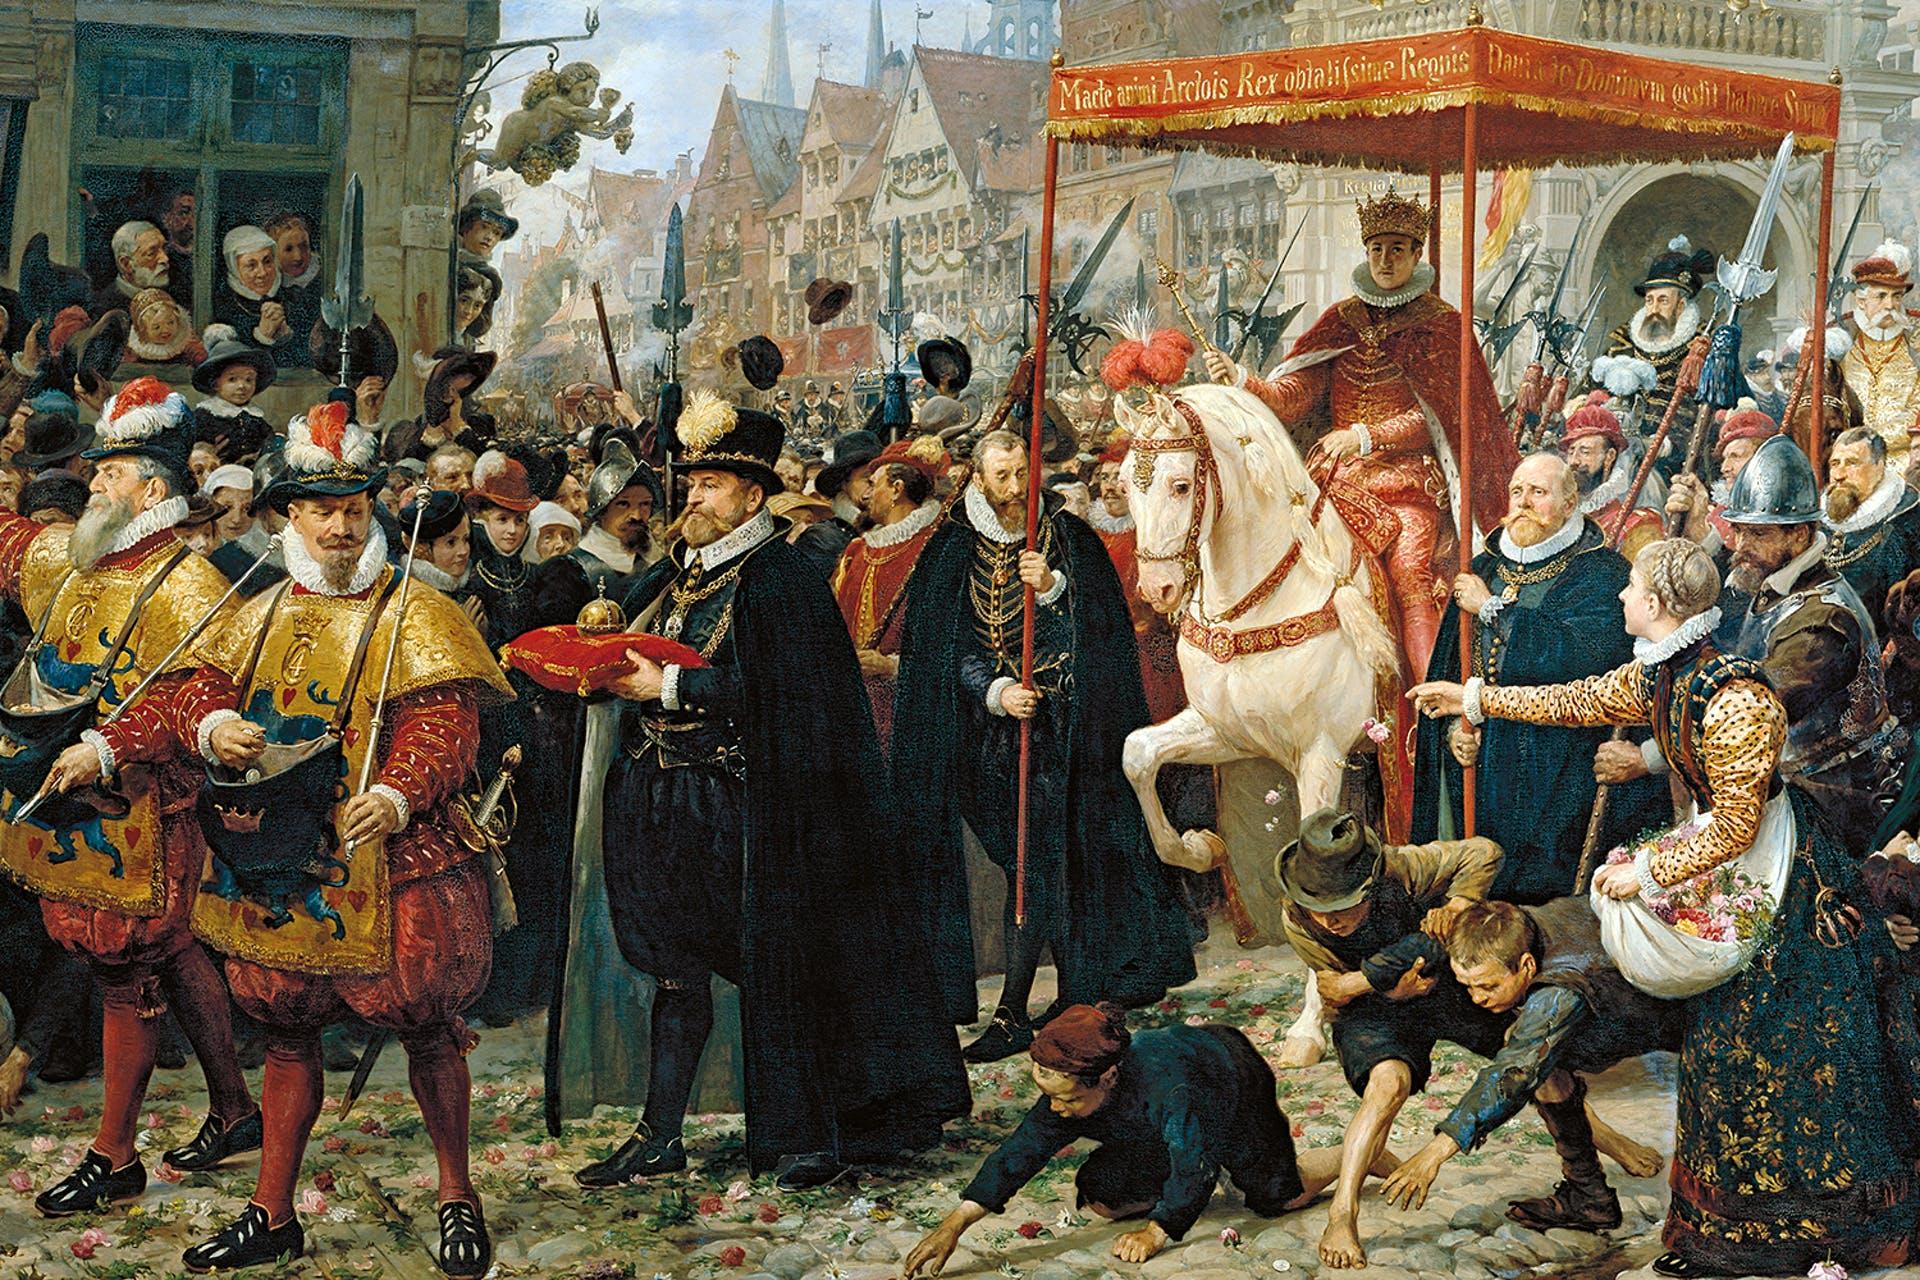 http://upload.wikimedia.org/wikipedia/commons/f/fa/Coronation_of_Christian_IV_in_1596.jpg